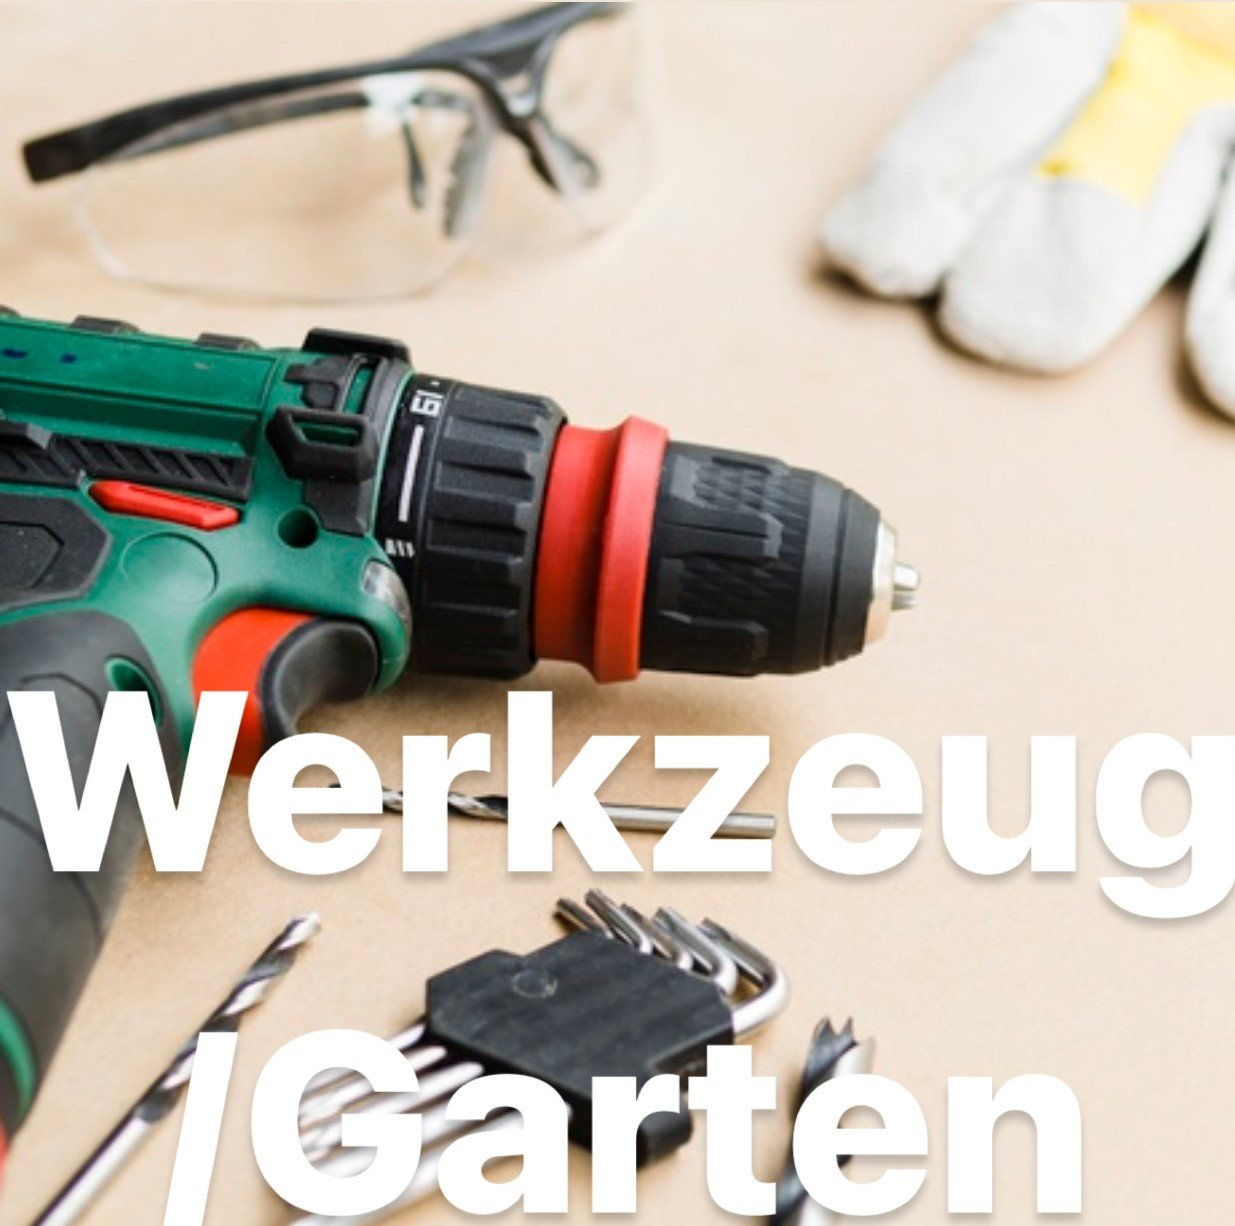 Werkzeug / tools